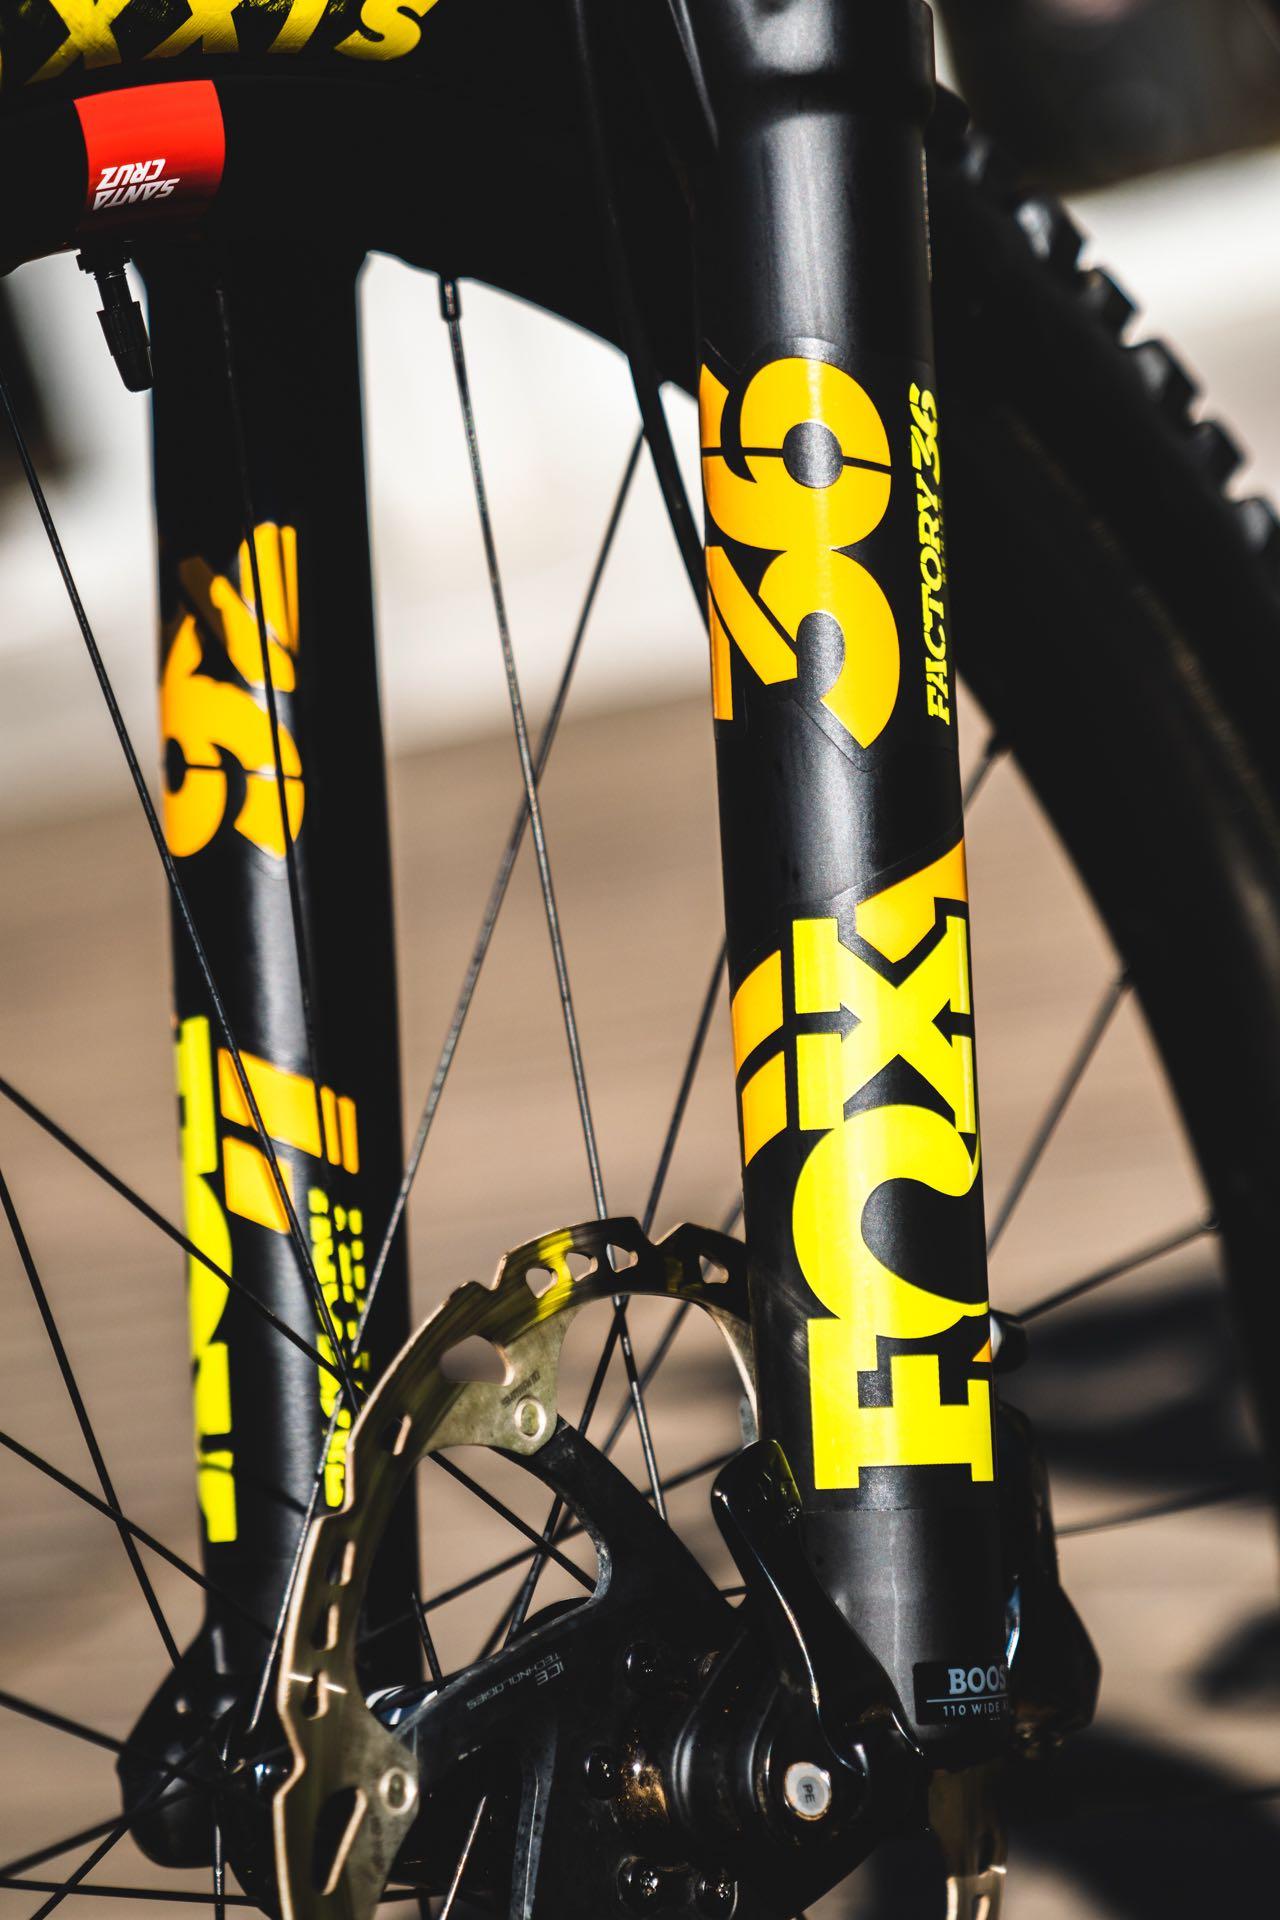 Meet the 2018 Santa Cruz Hightower LT Enduro Mountain Bike